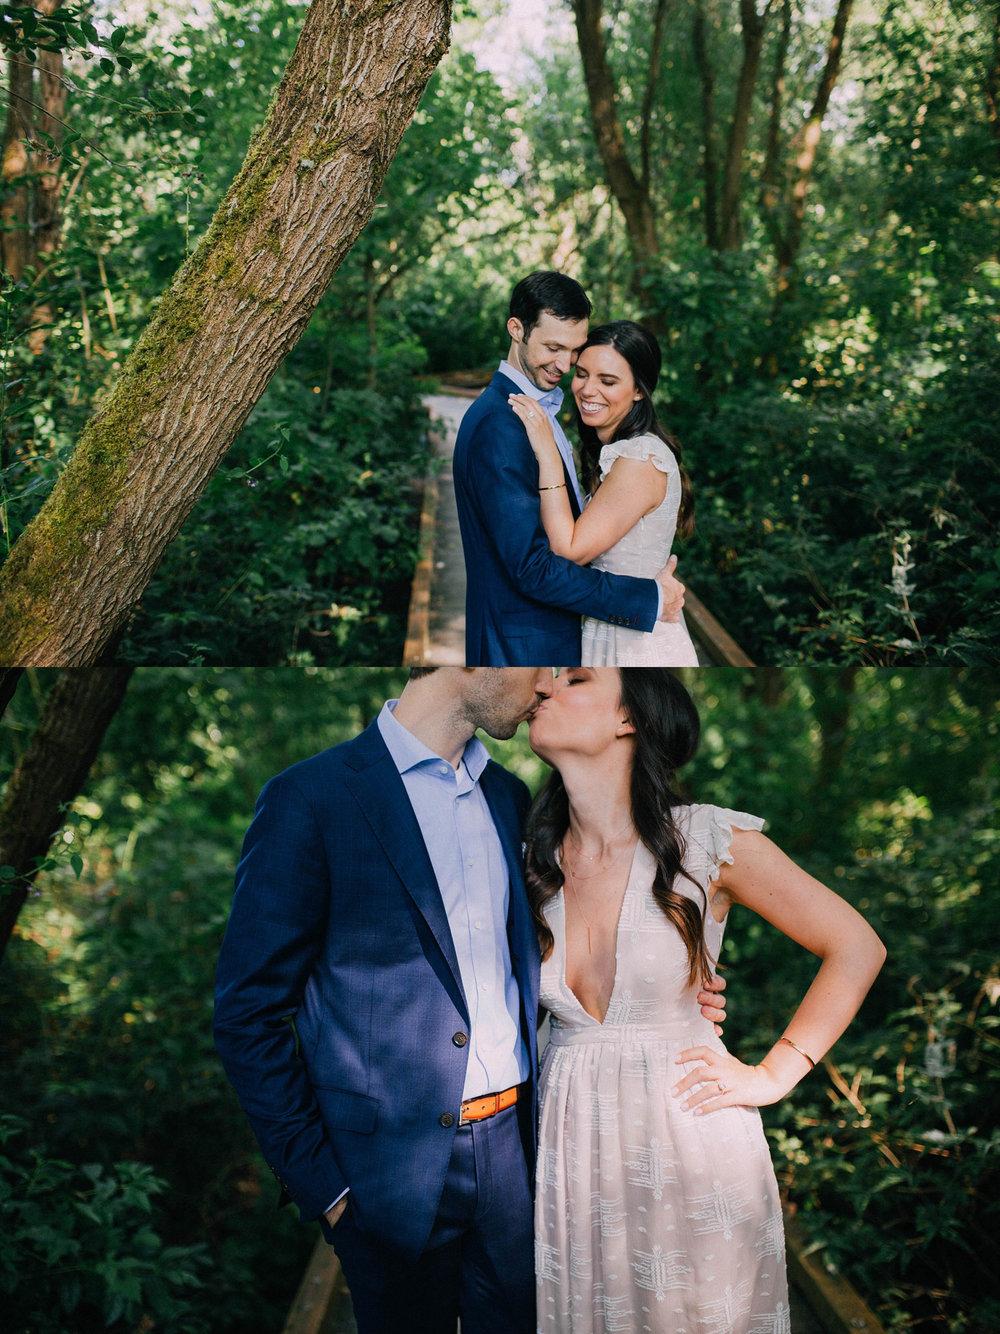 Seattle courthouse and wedding photographer ballard wedding ashley vos-16.jpg